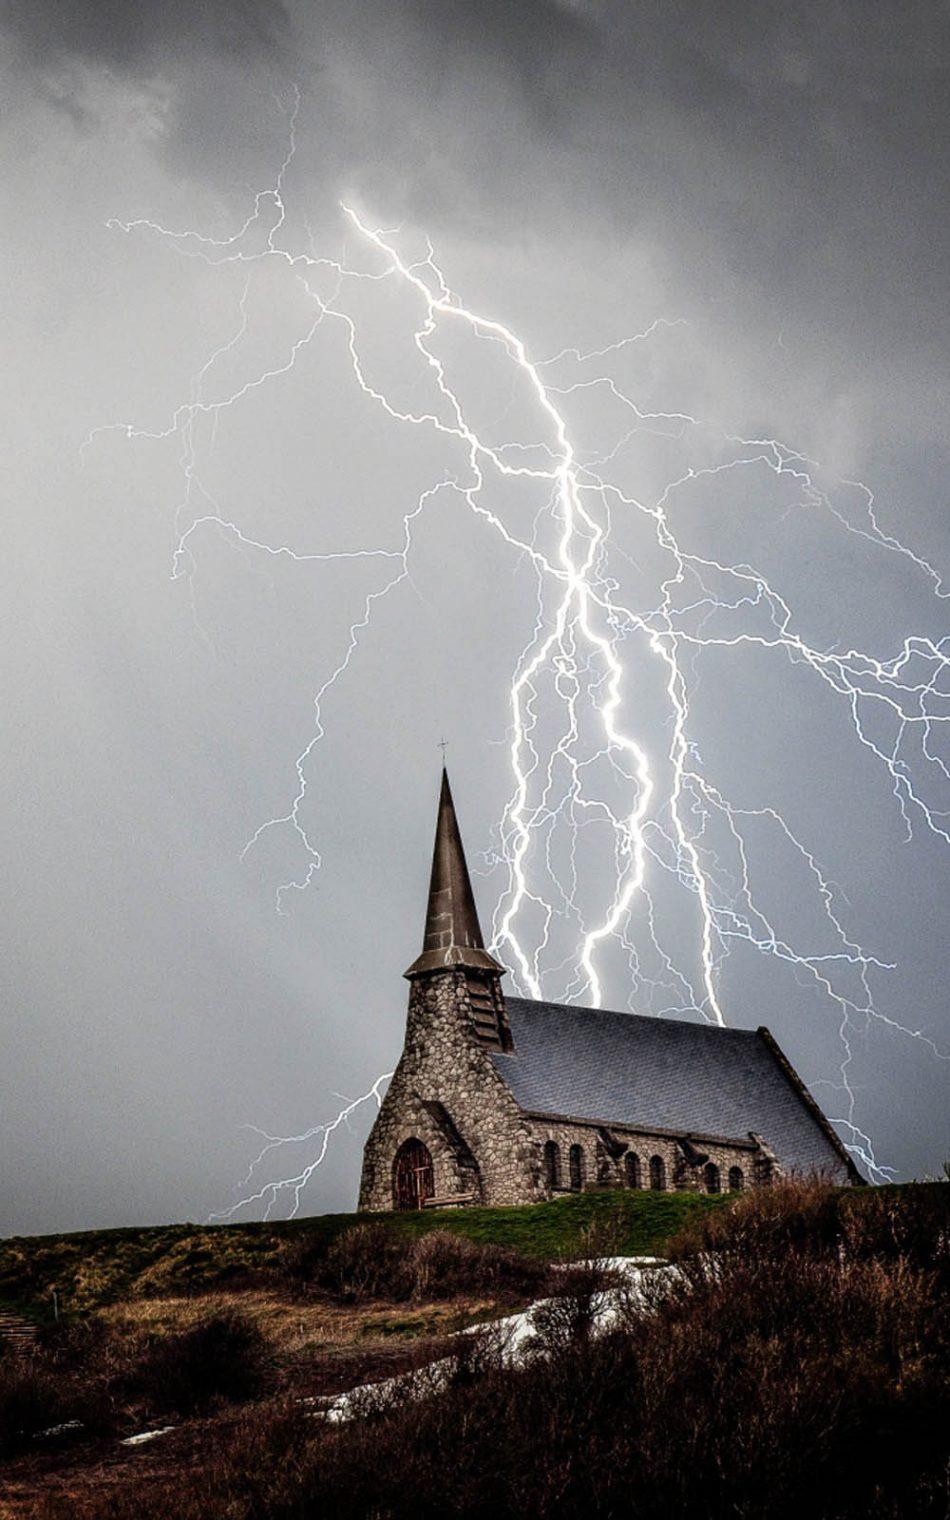 Church Storm Lightning HD Mobile Wallpaper